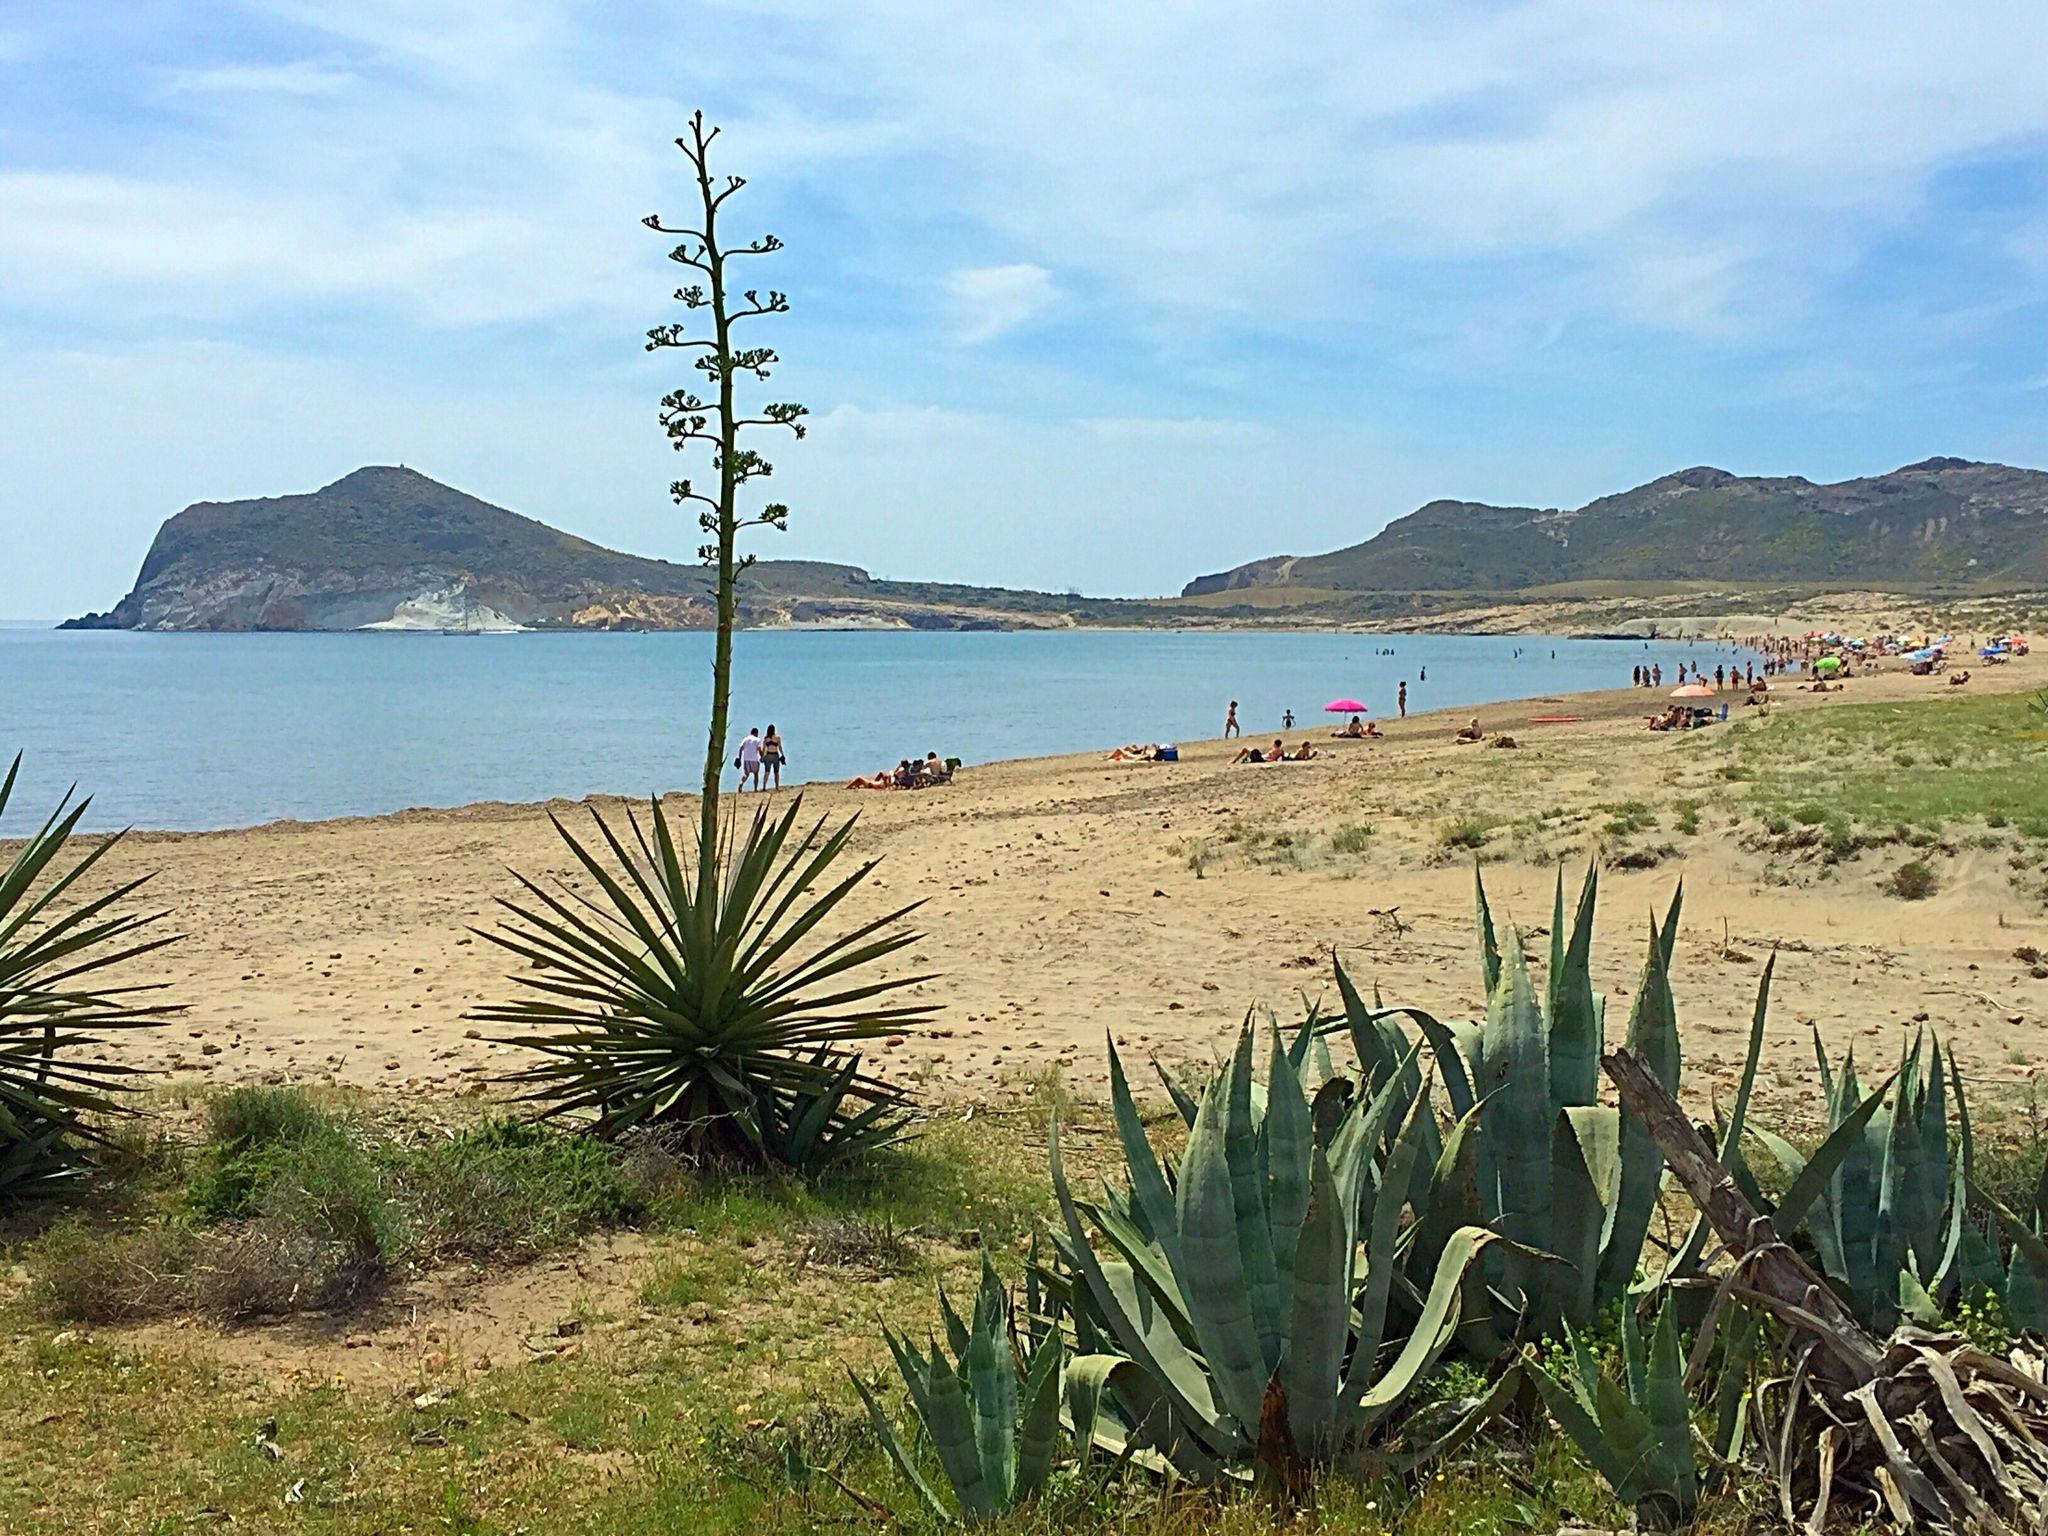 Genovese Beach San Jose Almeria Spain San Jose Almeria Cabo De Gata Almeria Almería